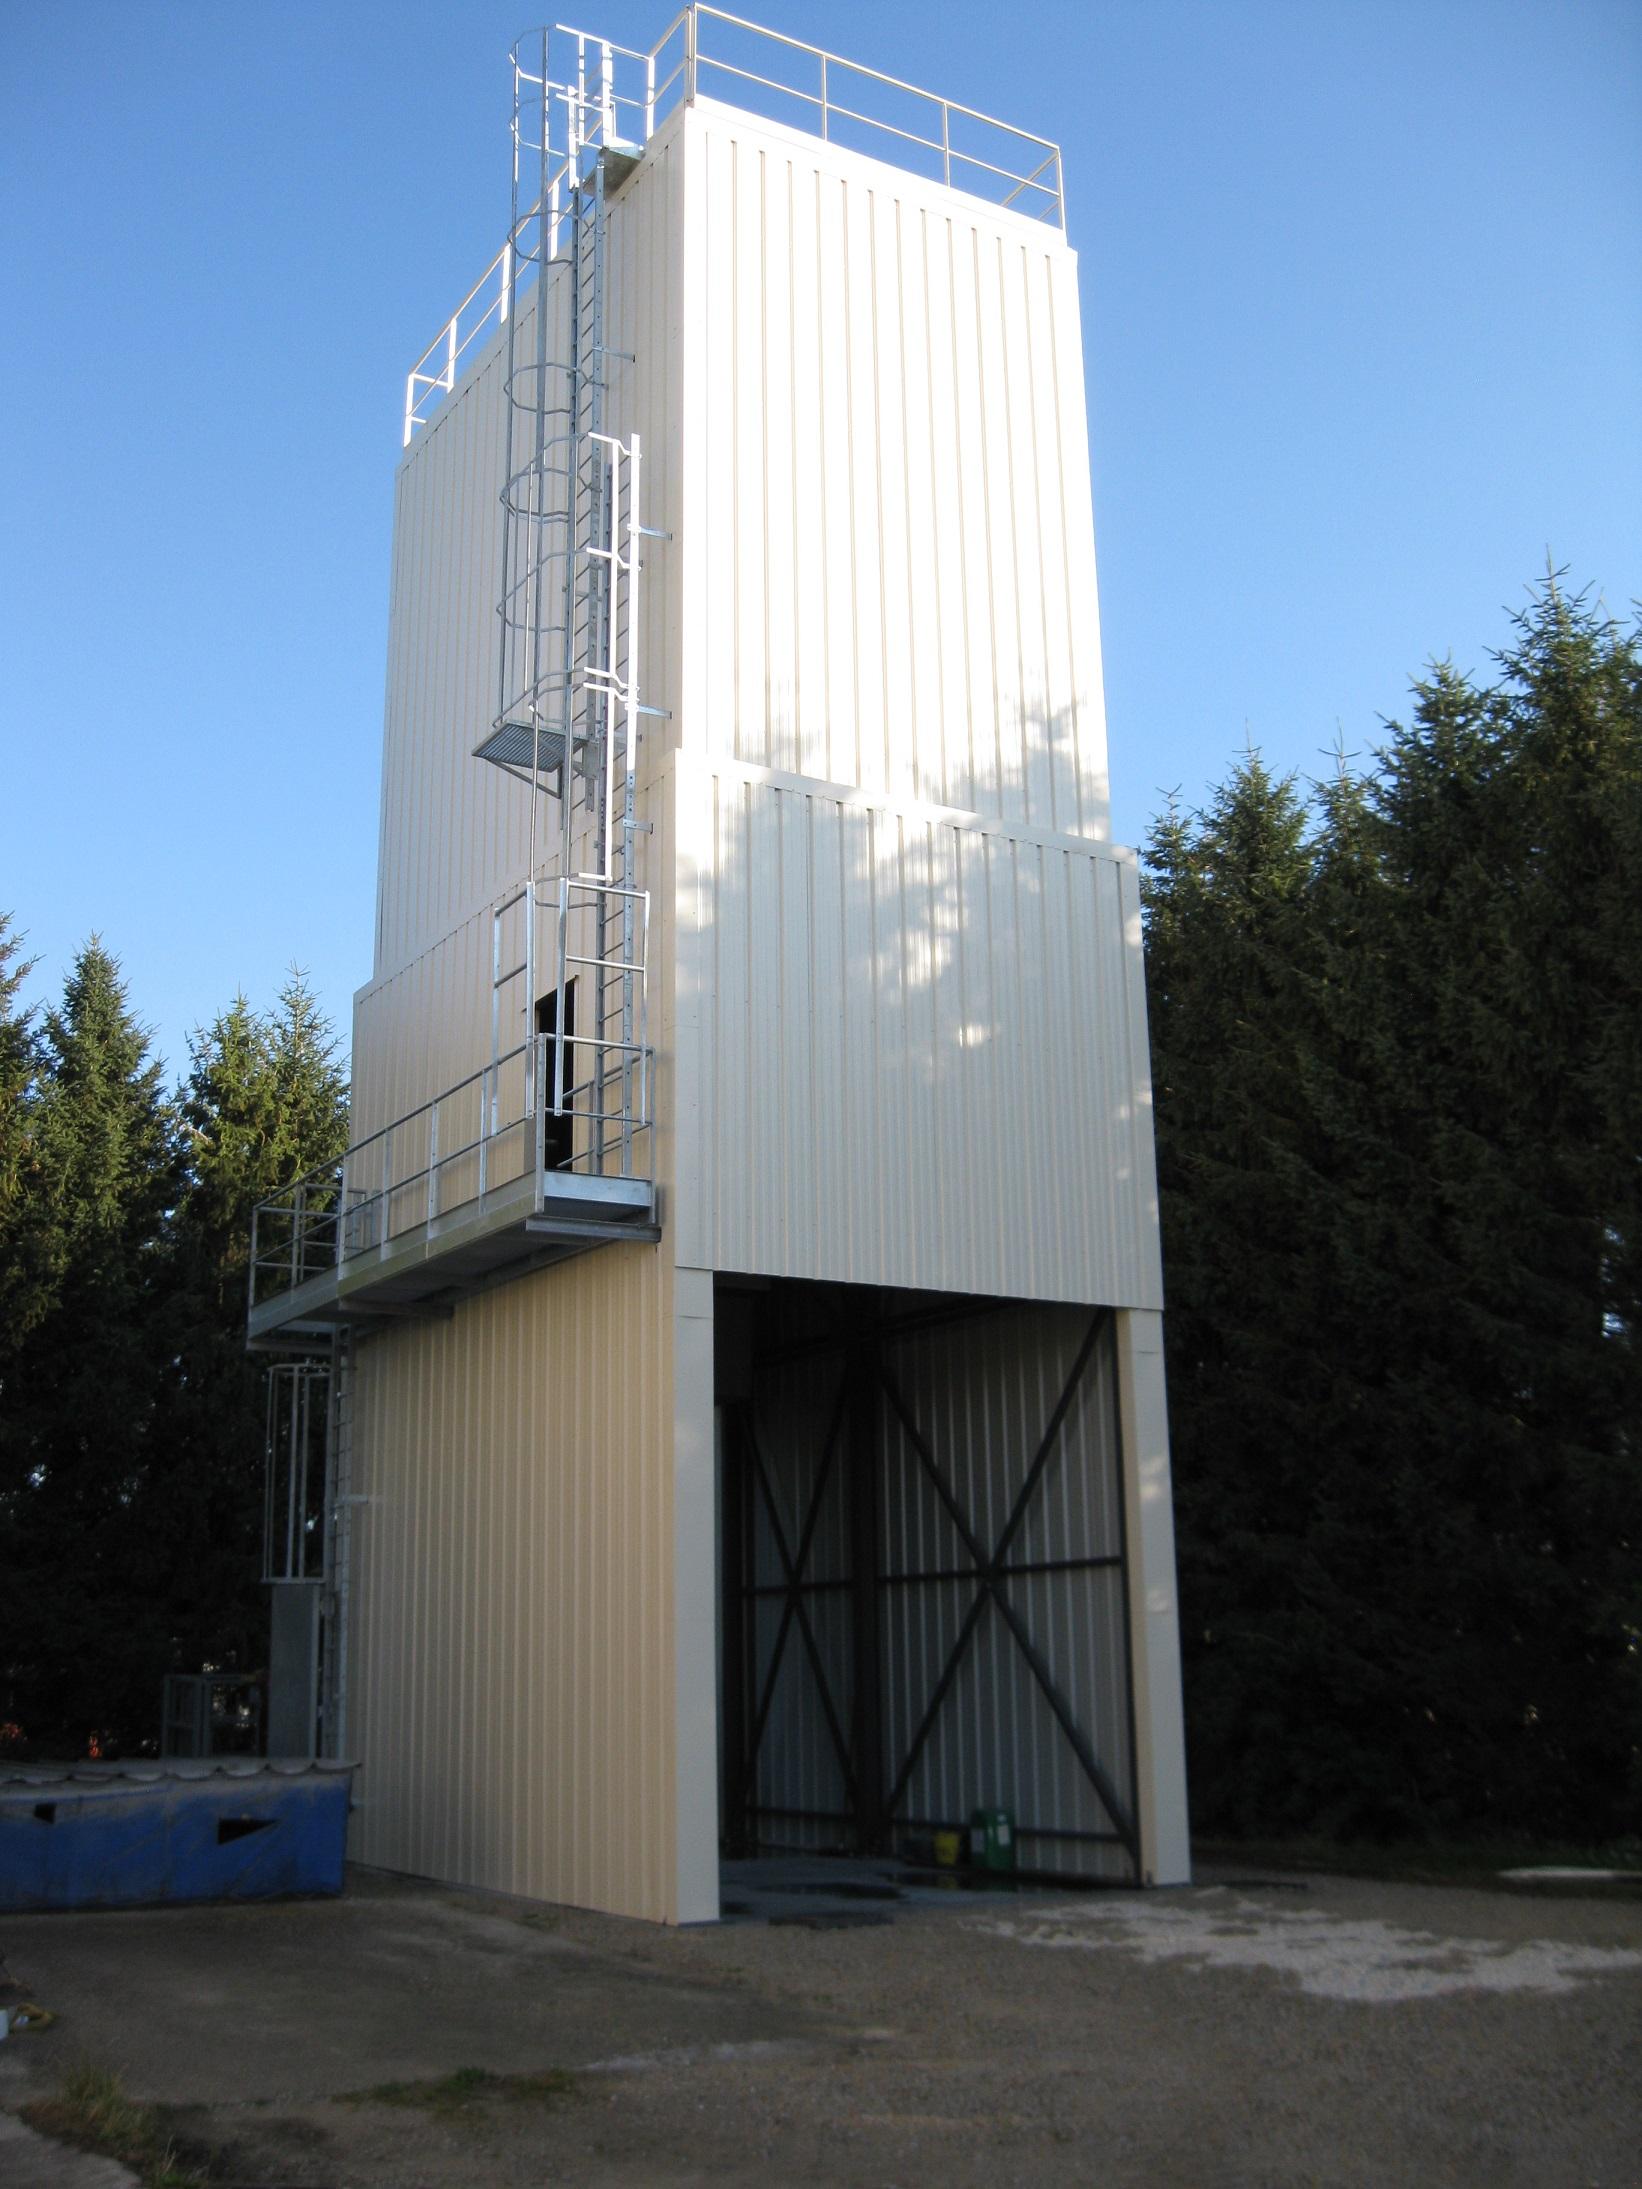 Silos de stockage grain Midi Pyrénées: Silo à son